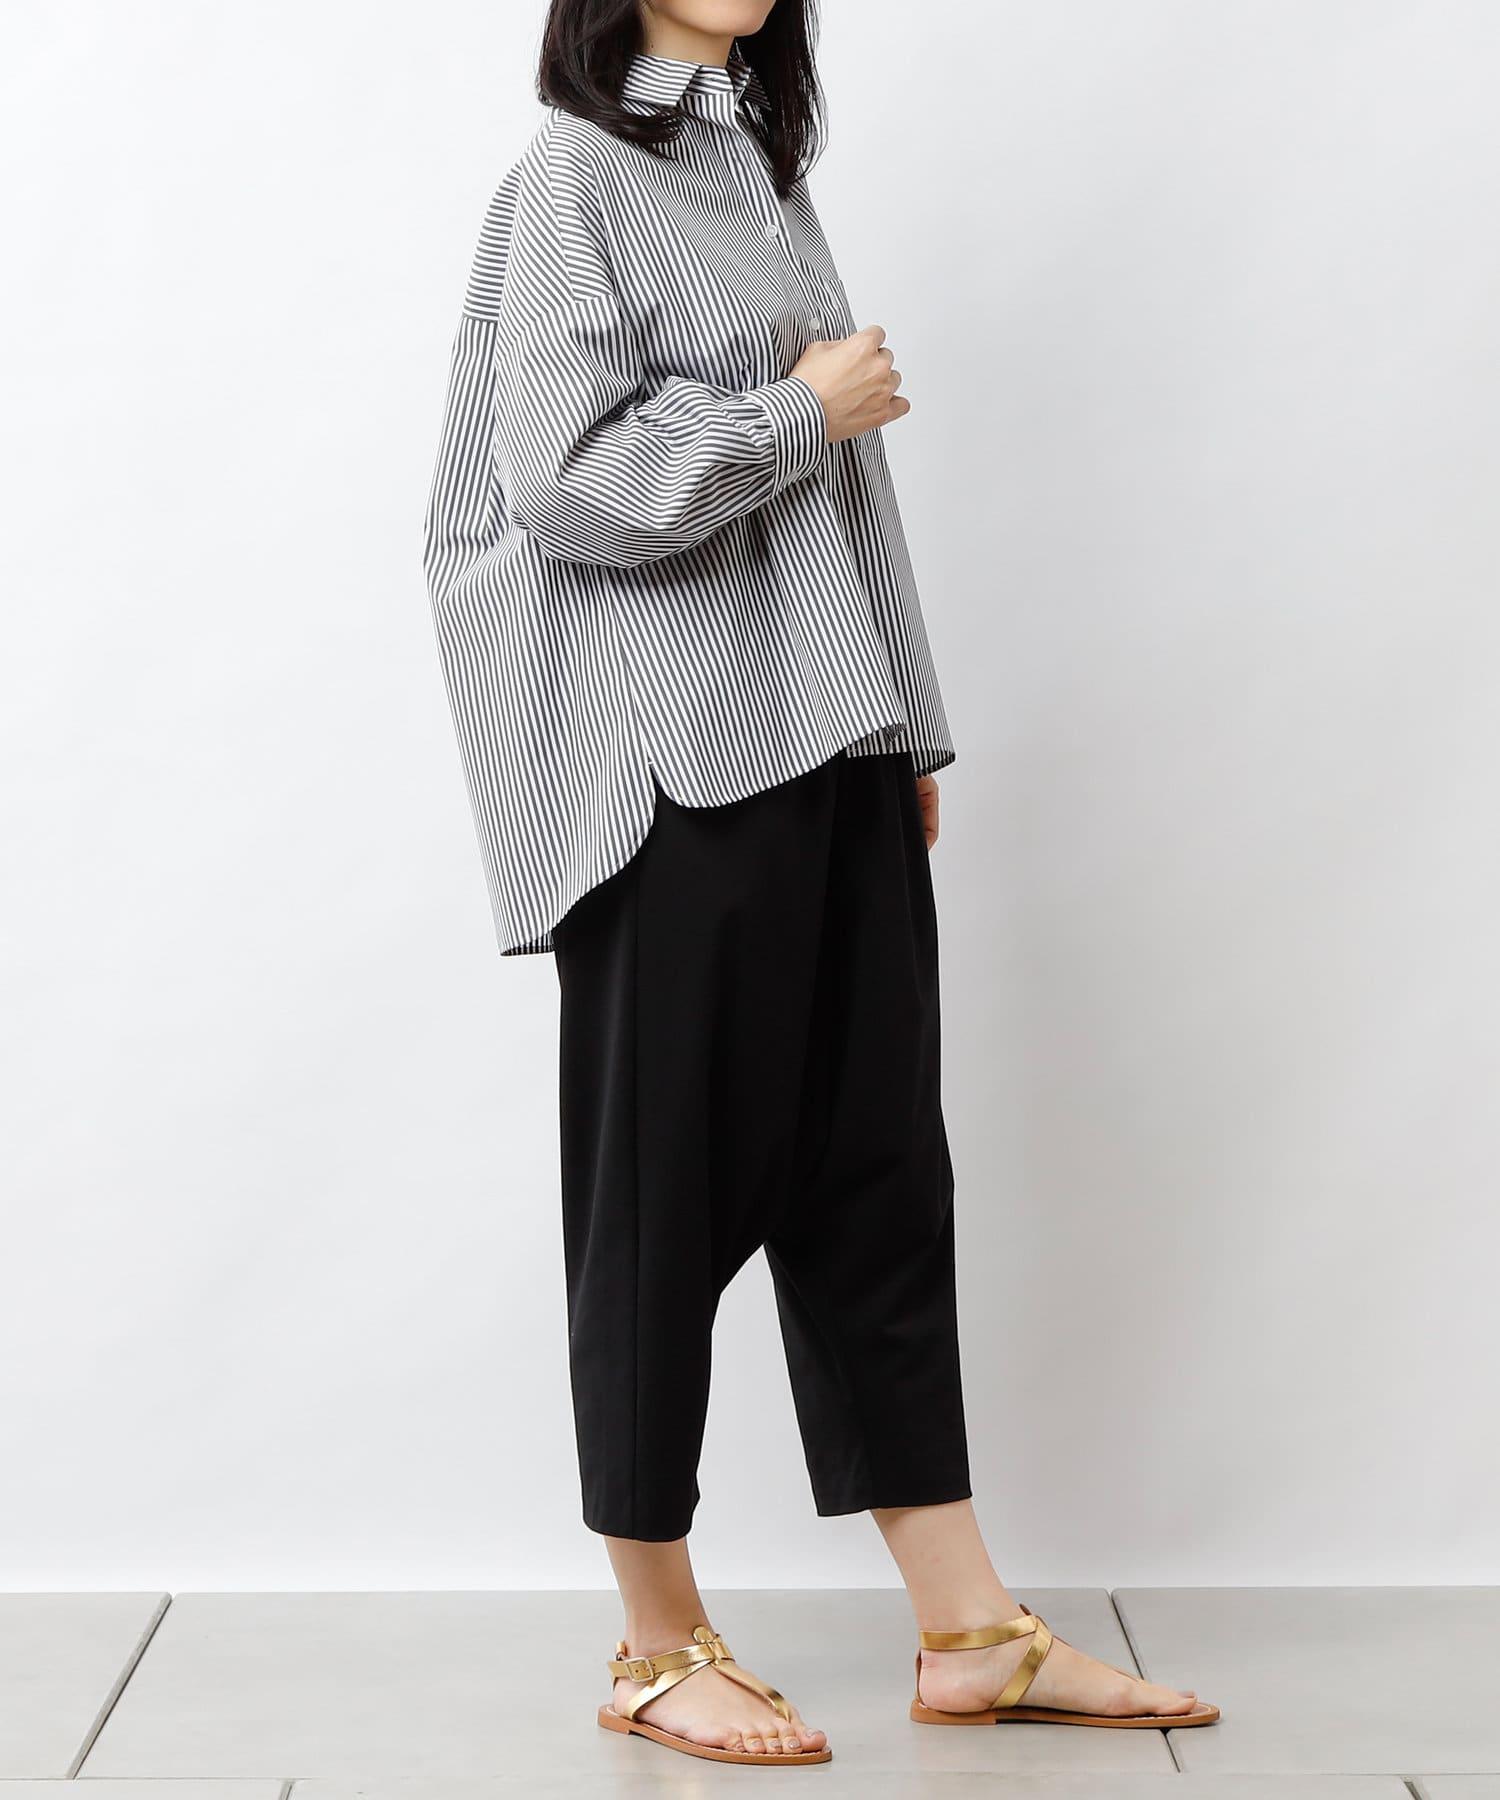 PLUS OTO.HA(プラス オトハ) 抜き衿美人 UVカットストライプシャツ